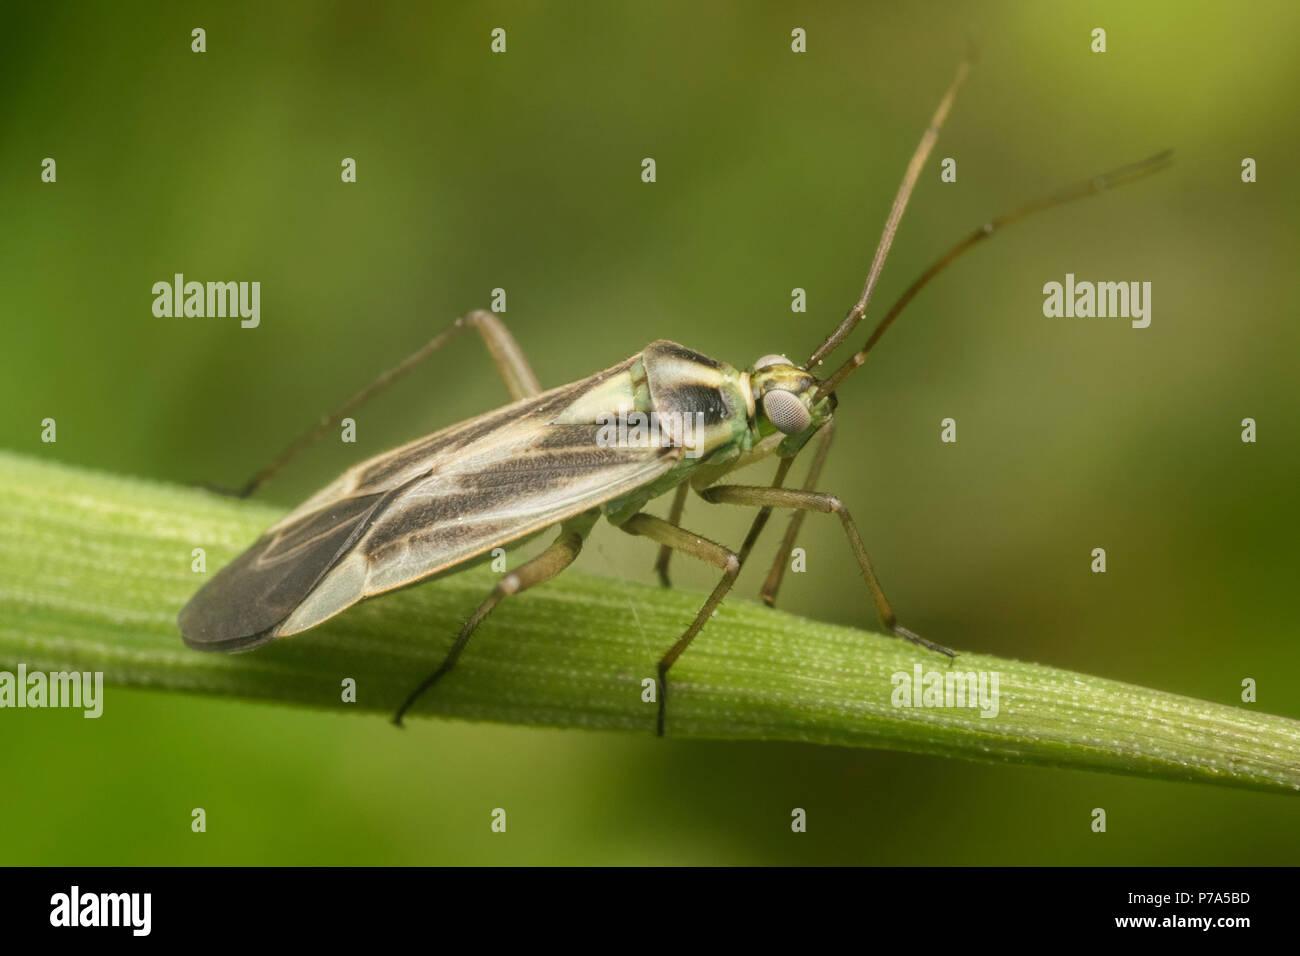 stenotus-binotatus-mirid-bug-resting-on-plant-stem-tipperary-ireland-P7A5BD.jpg